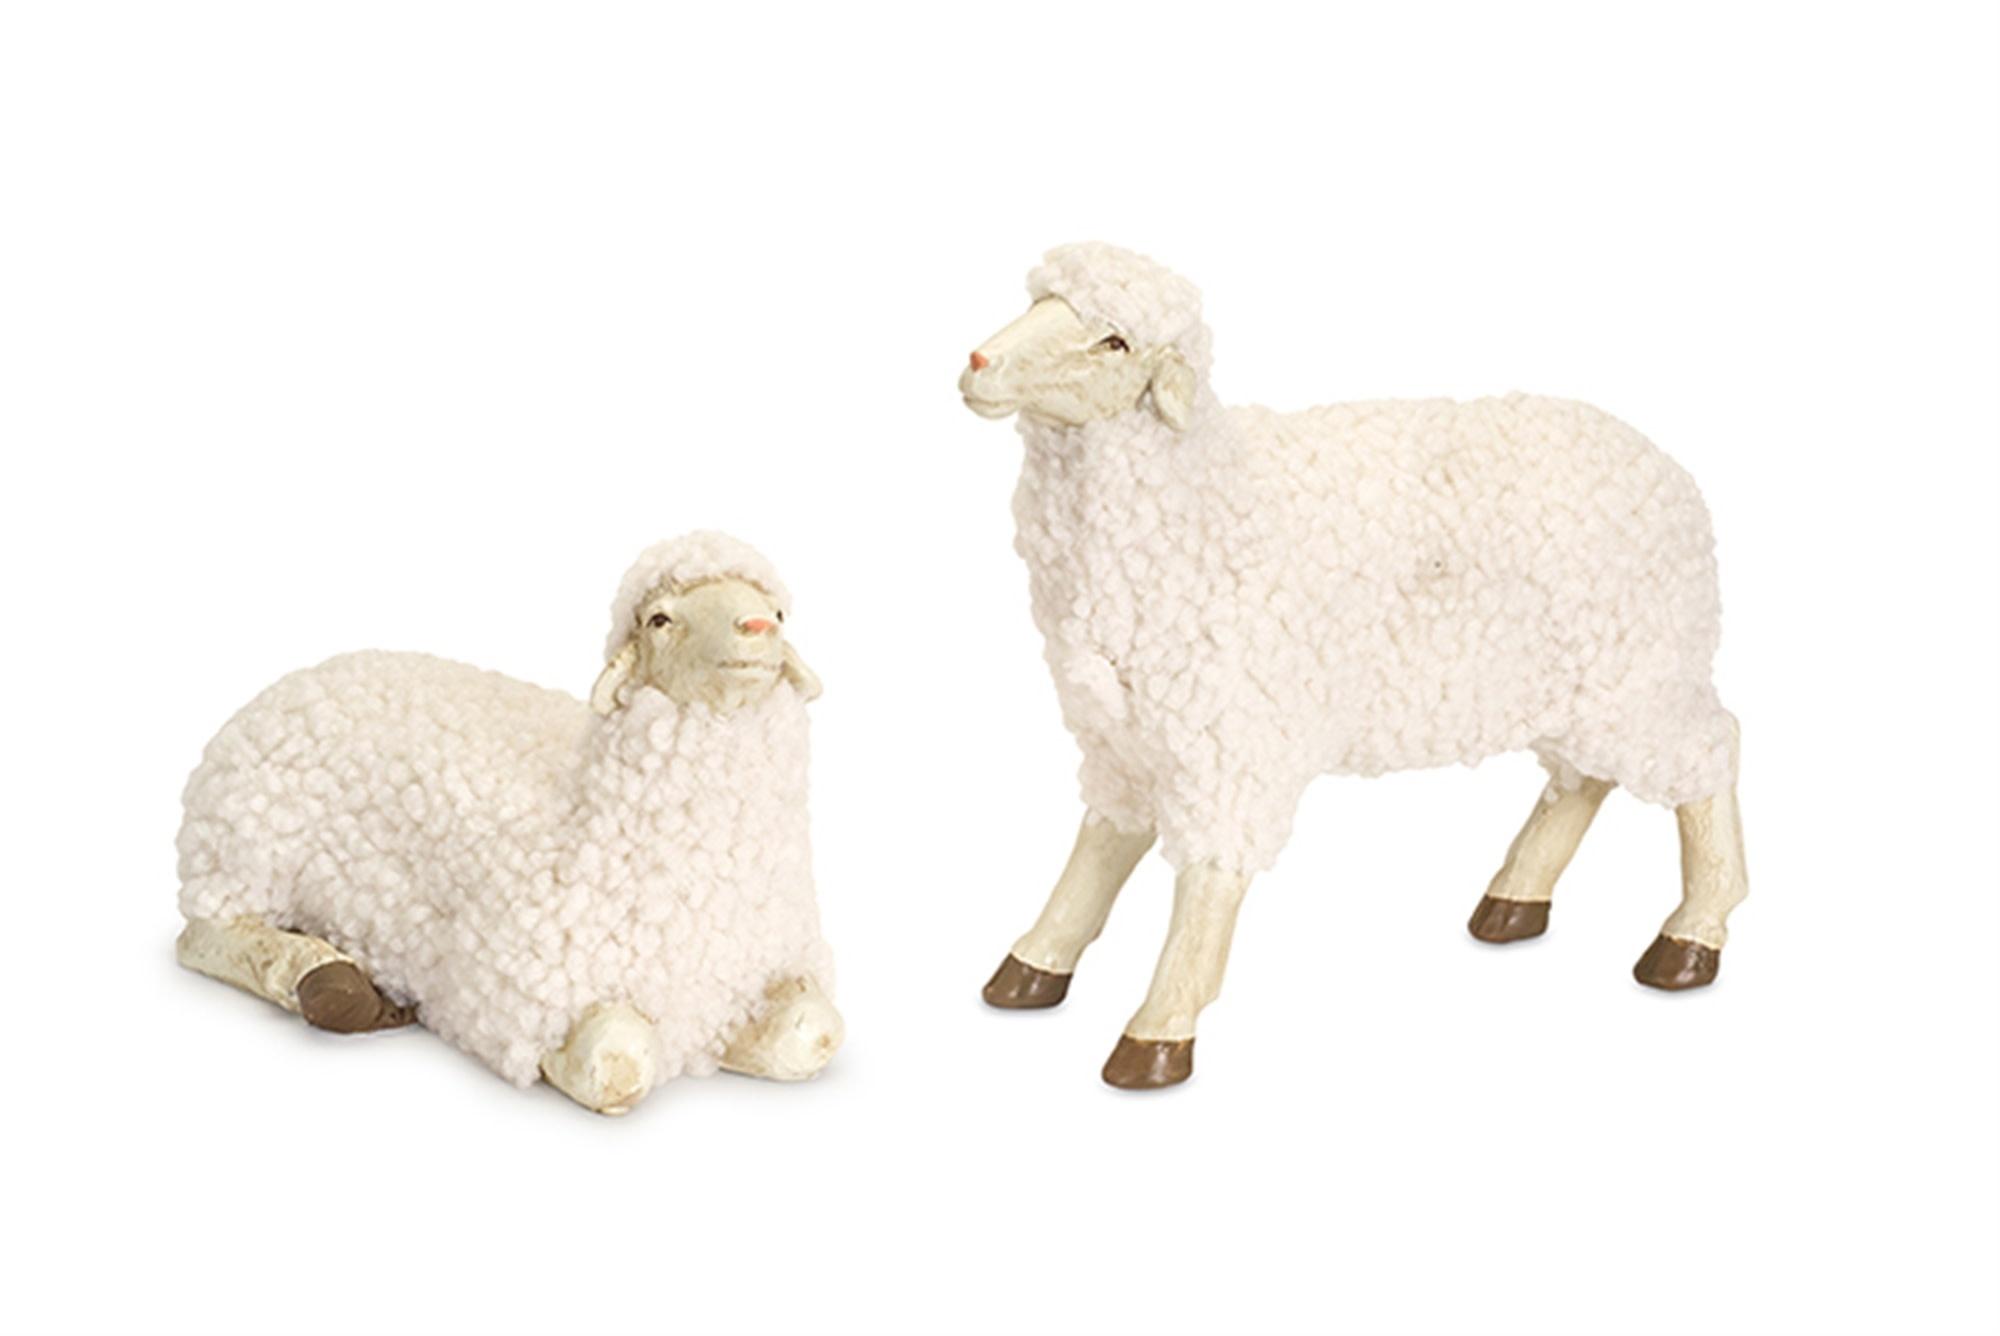 Set of 2 Small Fluffy Sheep